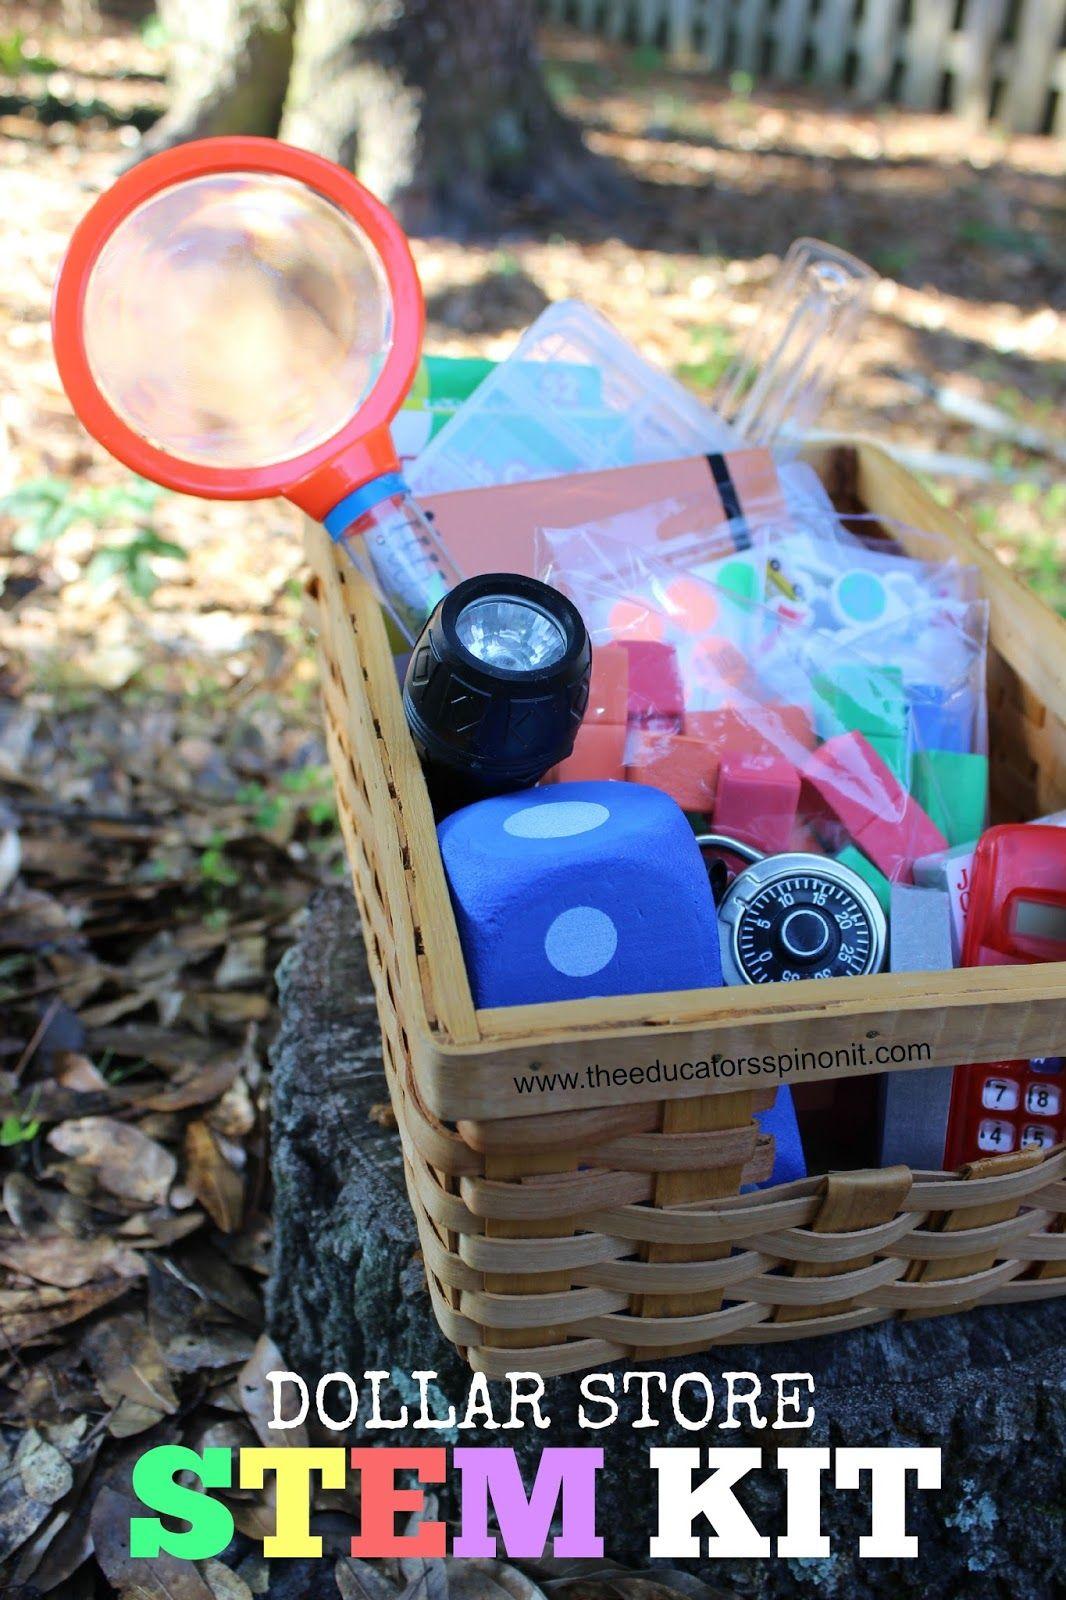 Dollar Store Stem Kit Fun Family Projects